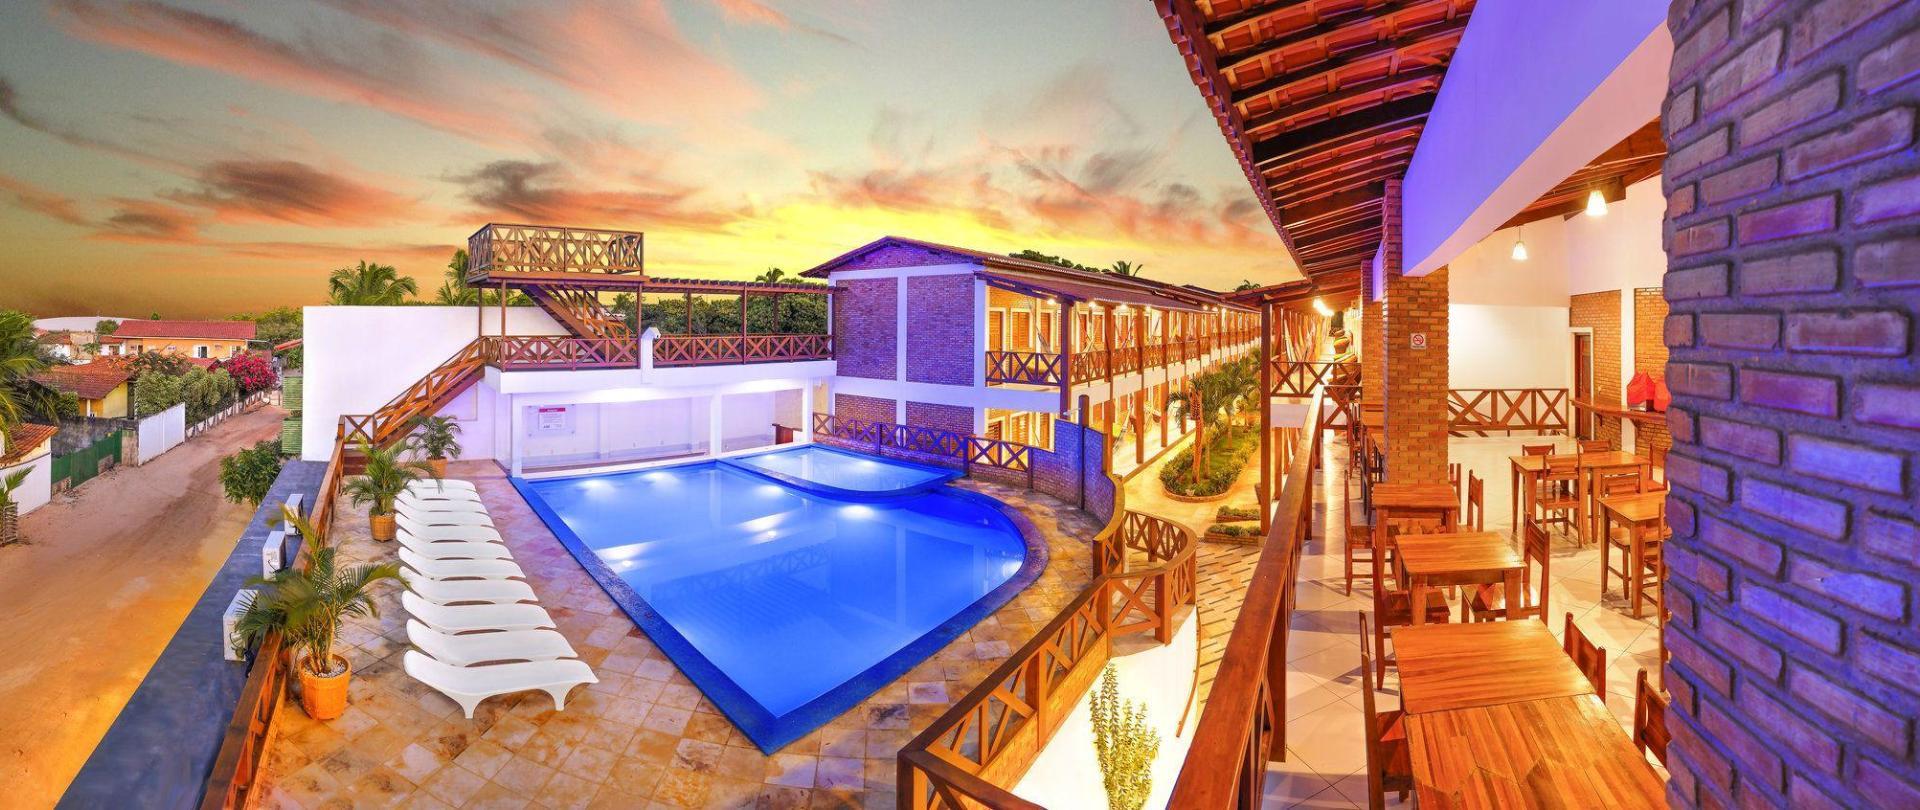 hotel_jeri_2016_panoramica_48.jpg